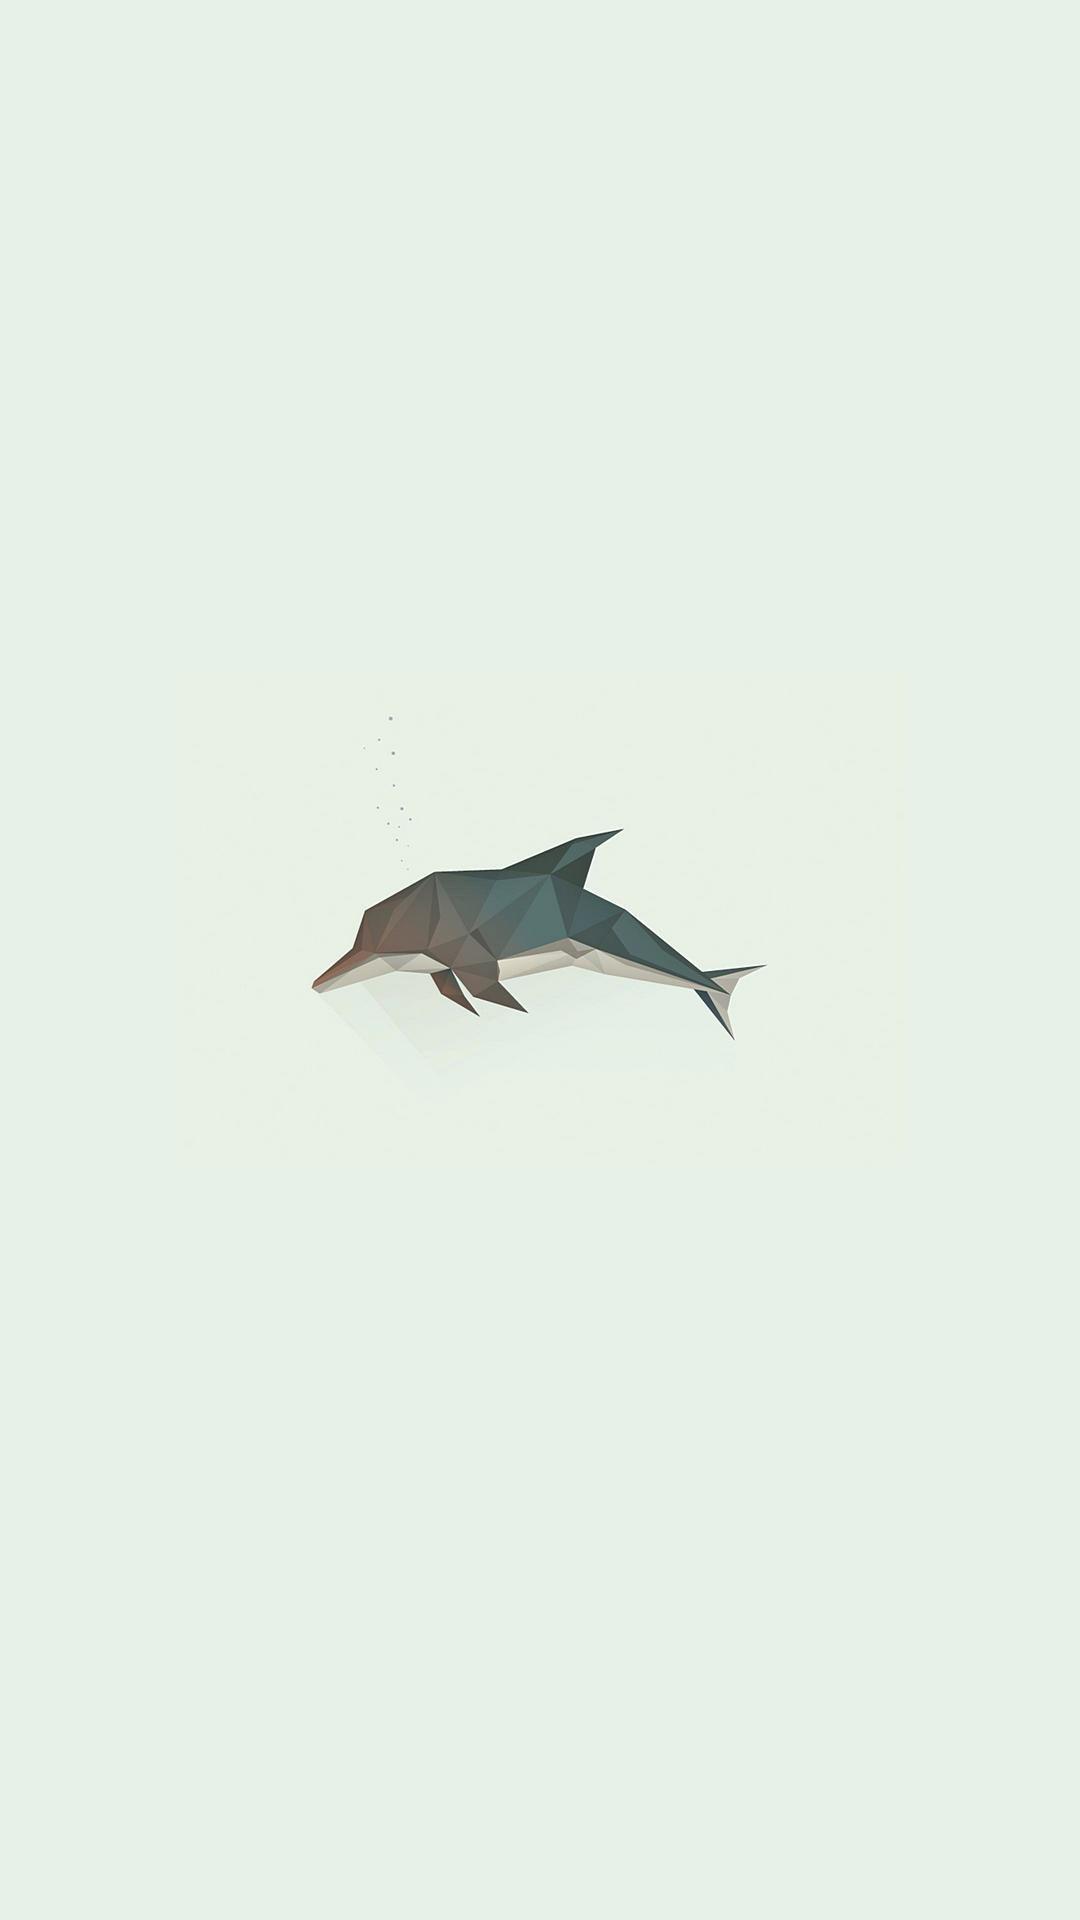 Mobile Full Hd Minimal Wallpaper 1080x1920 Dolphin Art Minimal Wallpaper Wallpaper